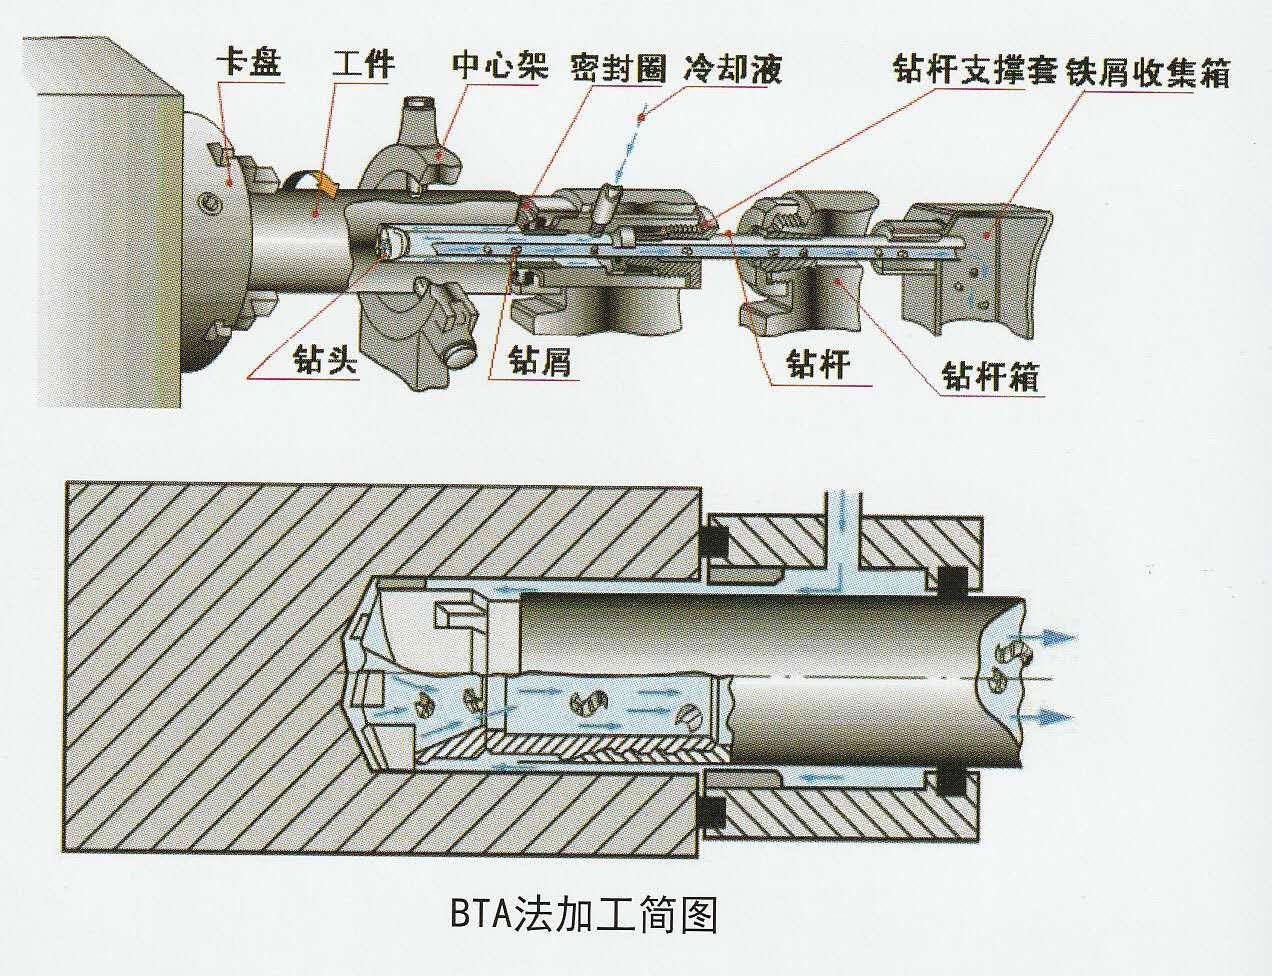 T2250 series CNC Deep hole boring machineBTA method High efficiencythe range of boring diameter 200mm500mm